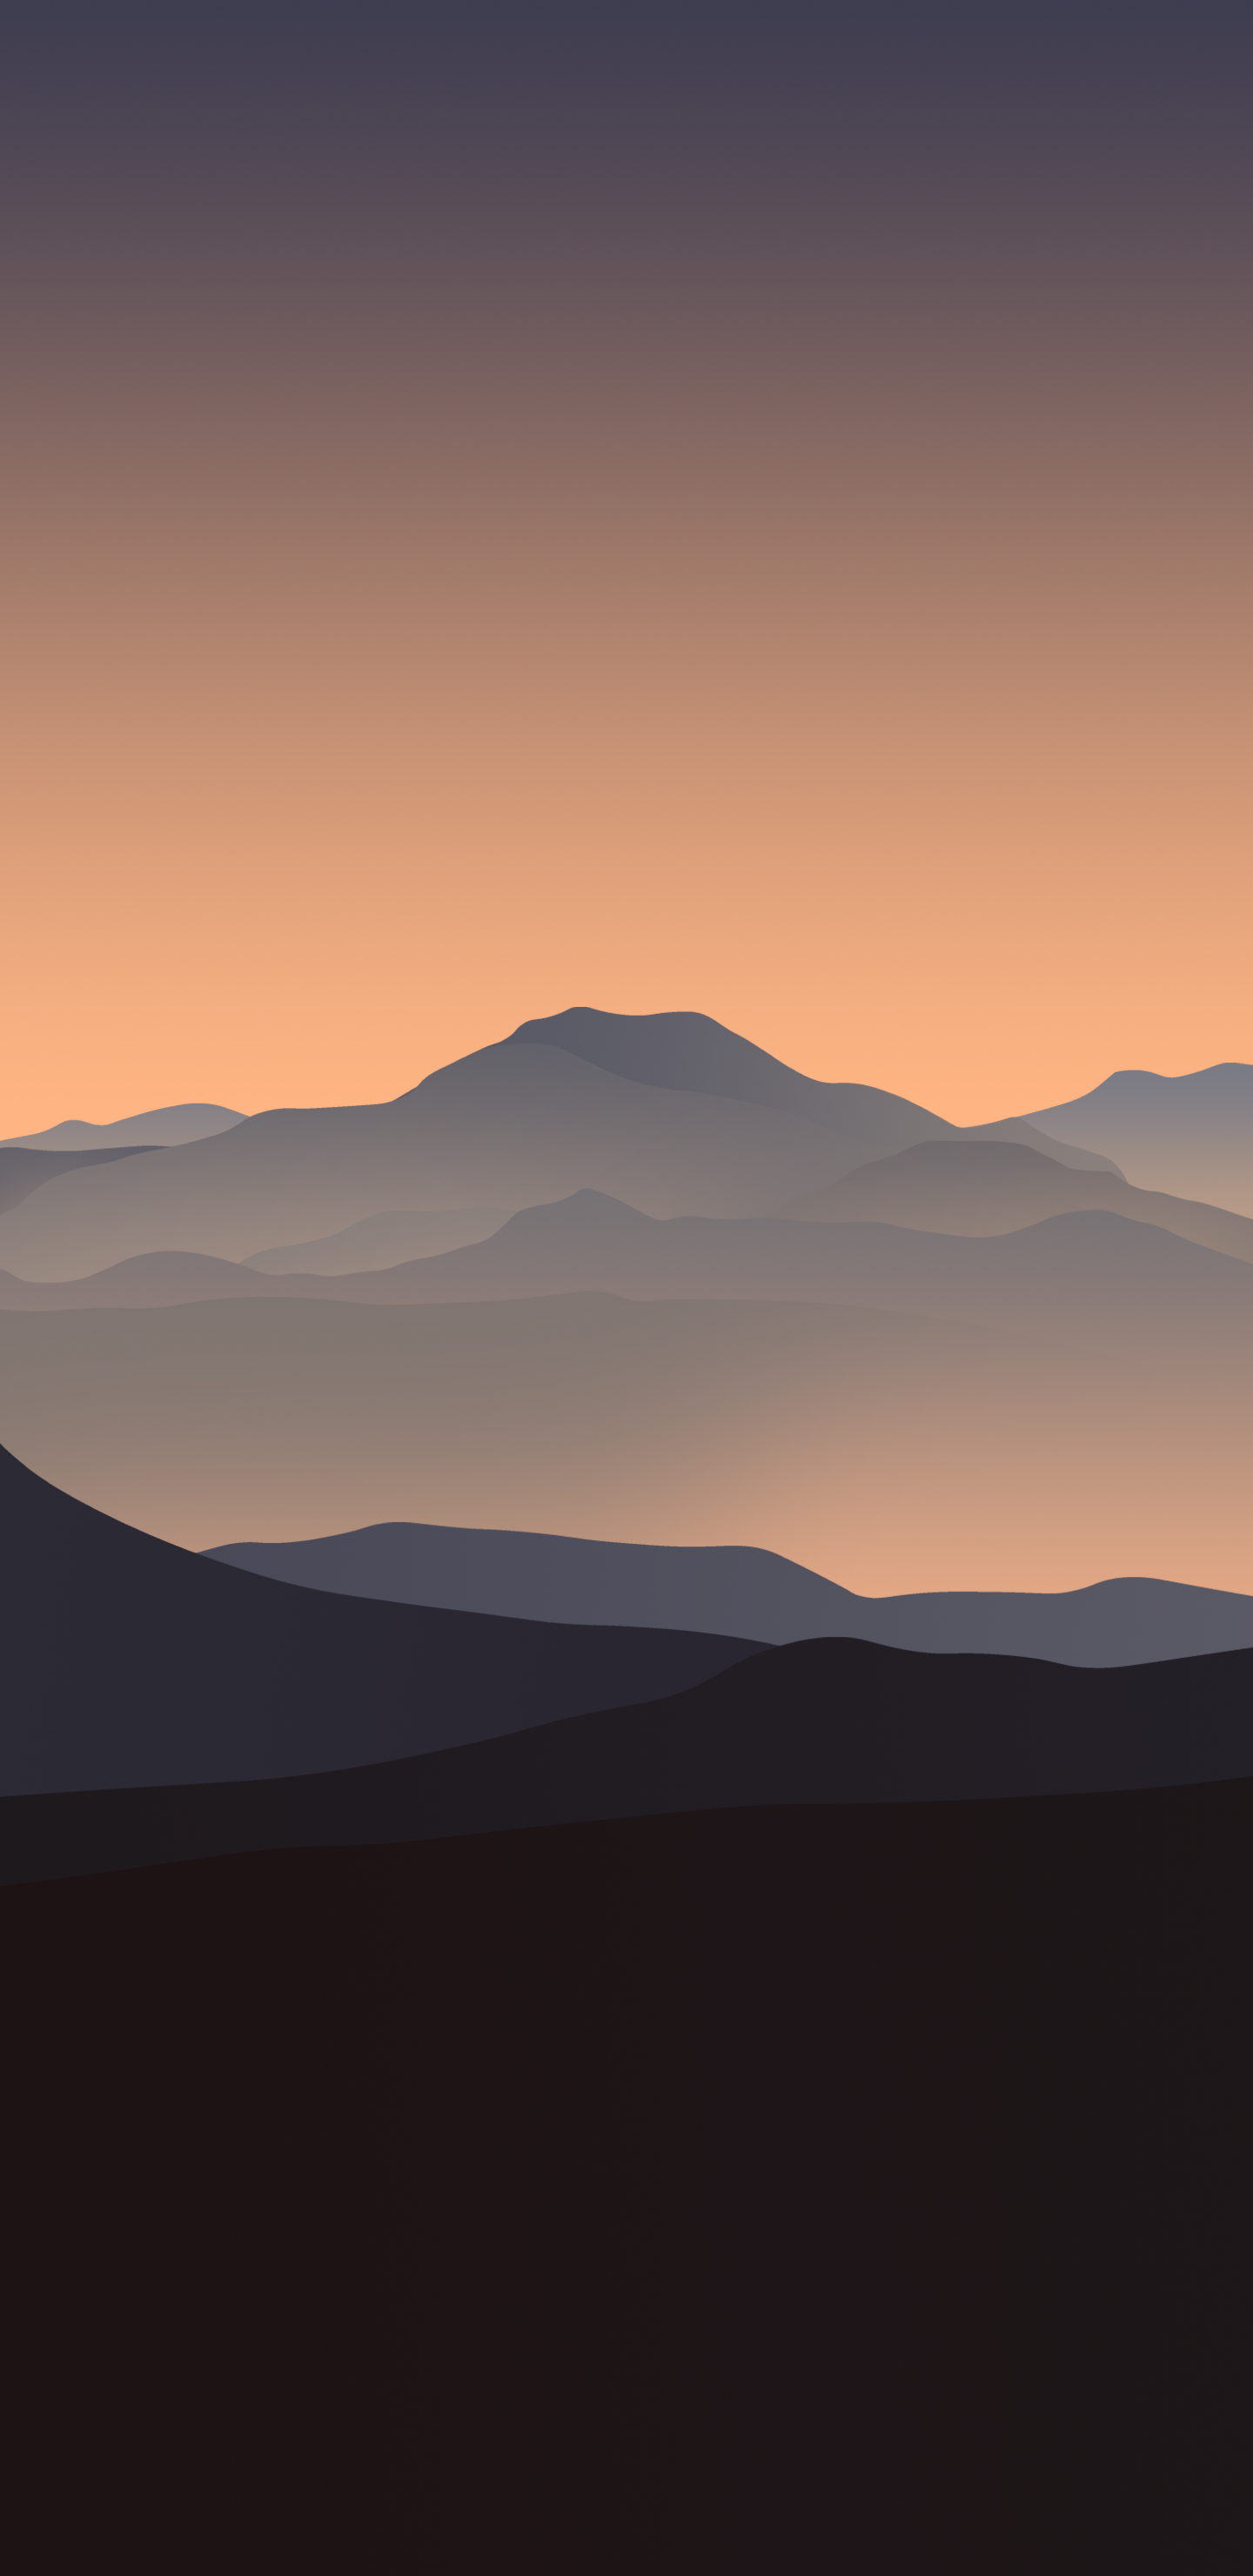 V4byarthur1992as Iphone Mountain Wallpaper Sunset Orange - Sunset Iphone Wallpaper Mountains , HD Wallpaper & Backgrounds